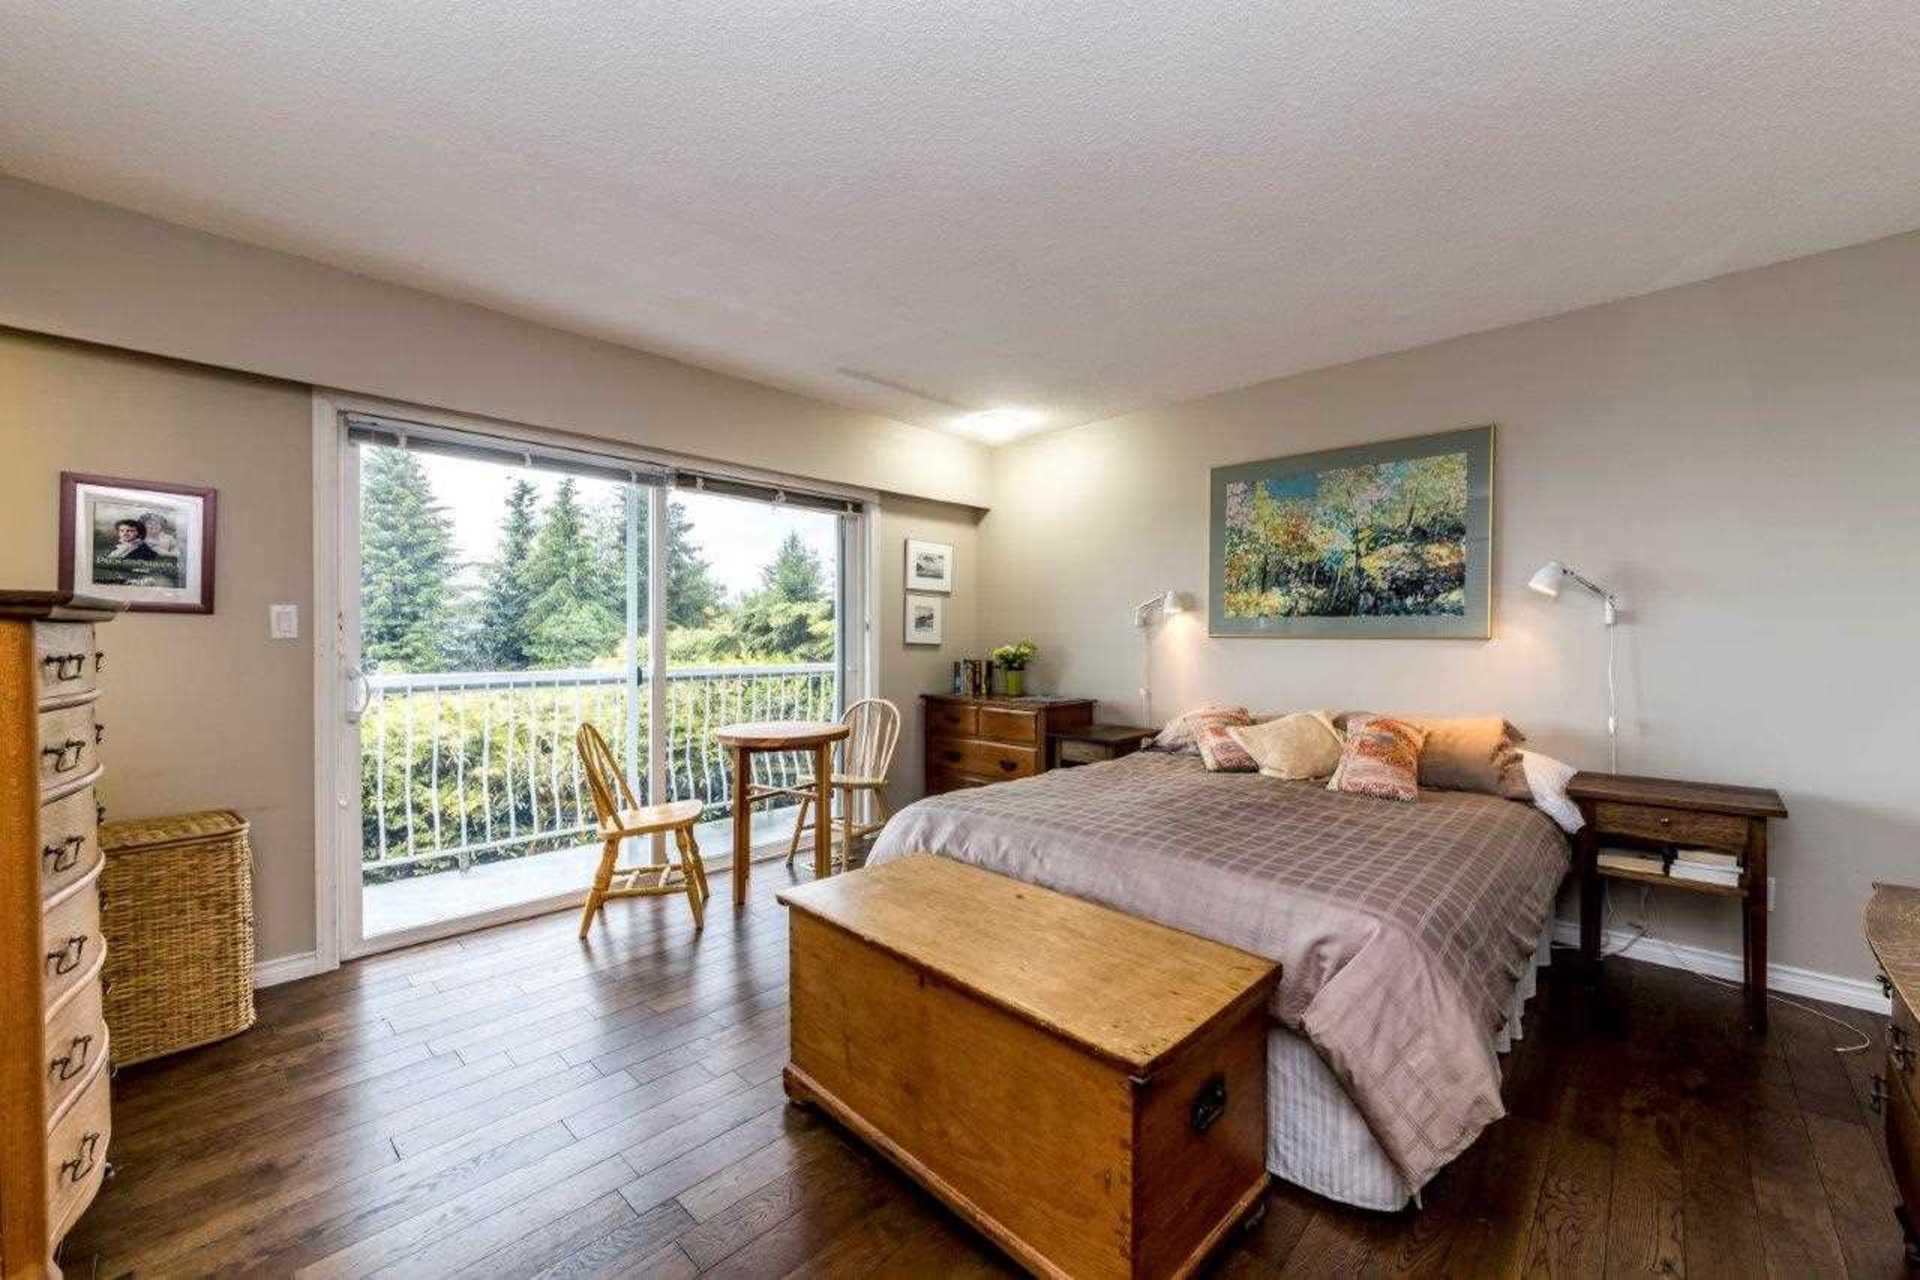 3863-st-pauls-avenue-upper-lonsdale-north-vancouver-11 at 3863 St. Pauls Avenue, Upper Lonsdale, North Vancouver